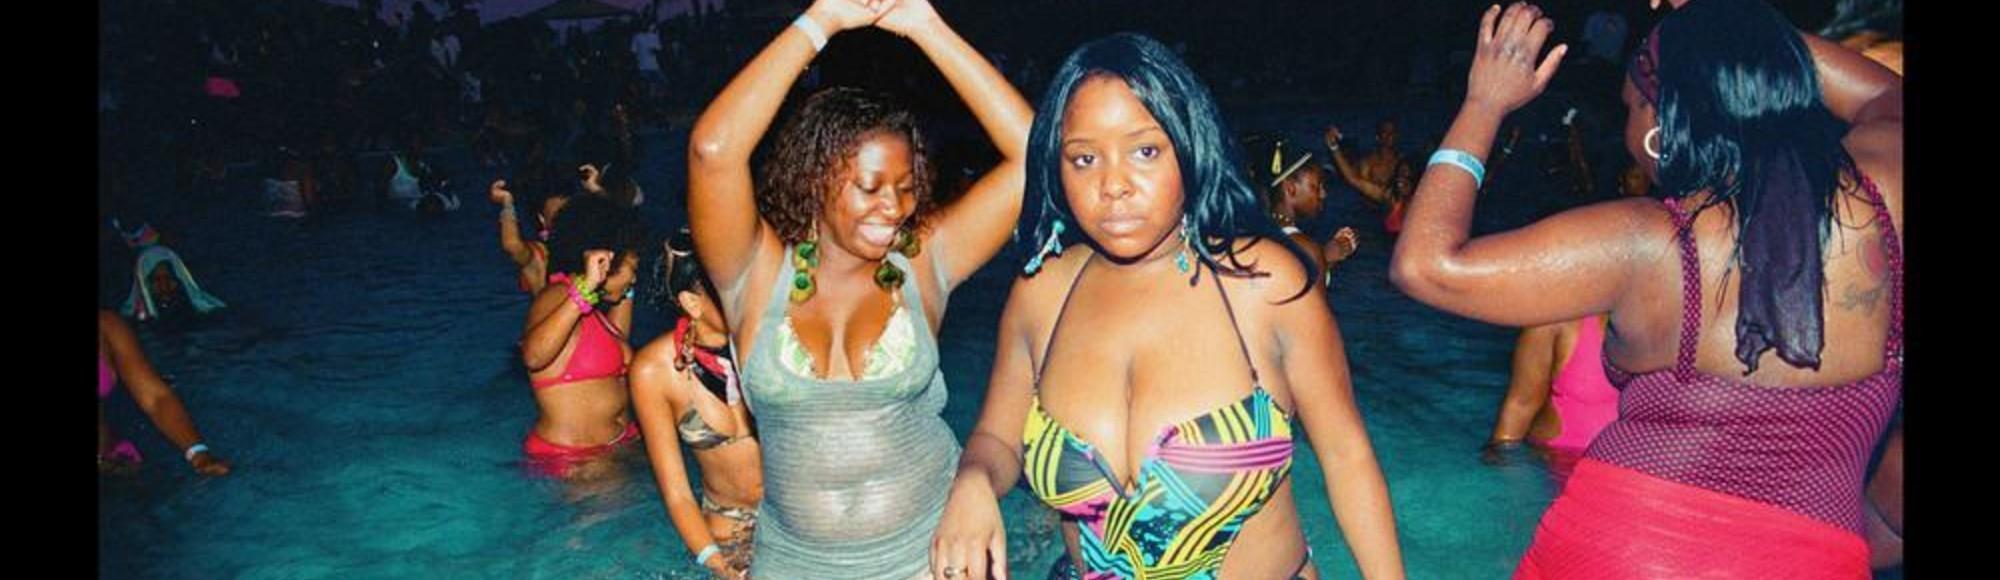 Photos from Inside Atlanta's Strip Clubs